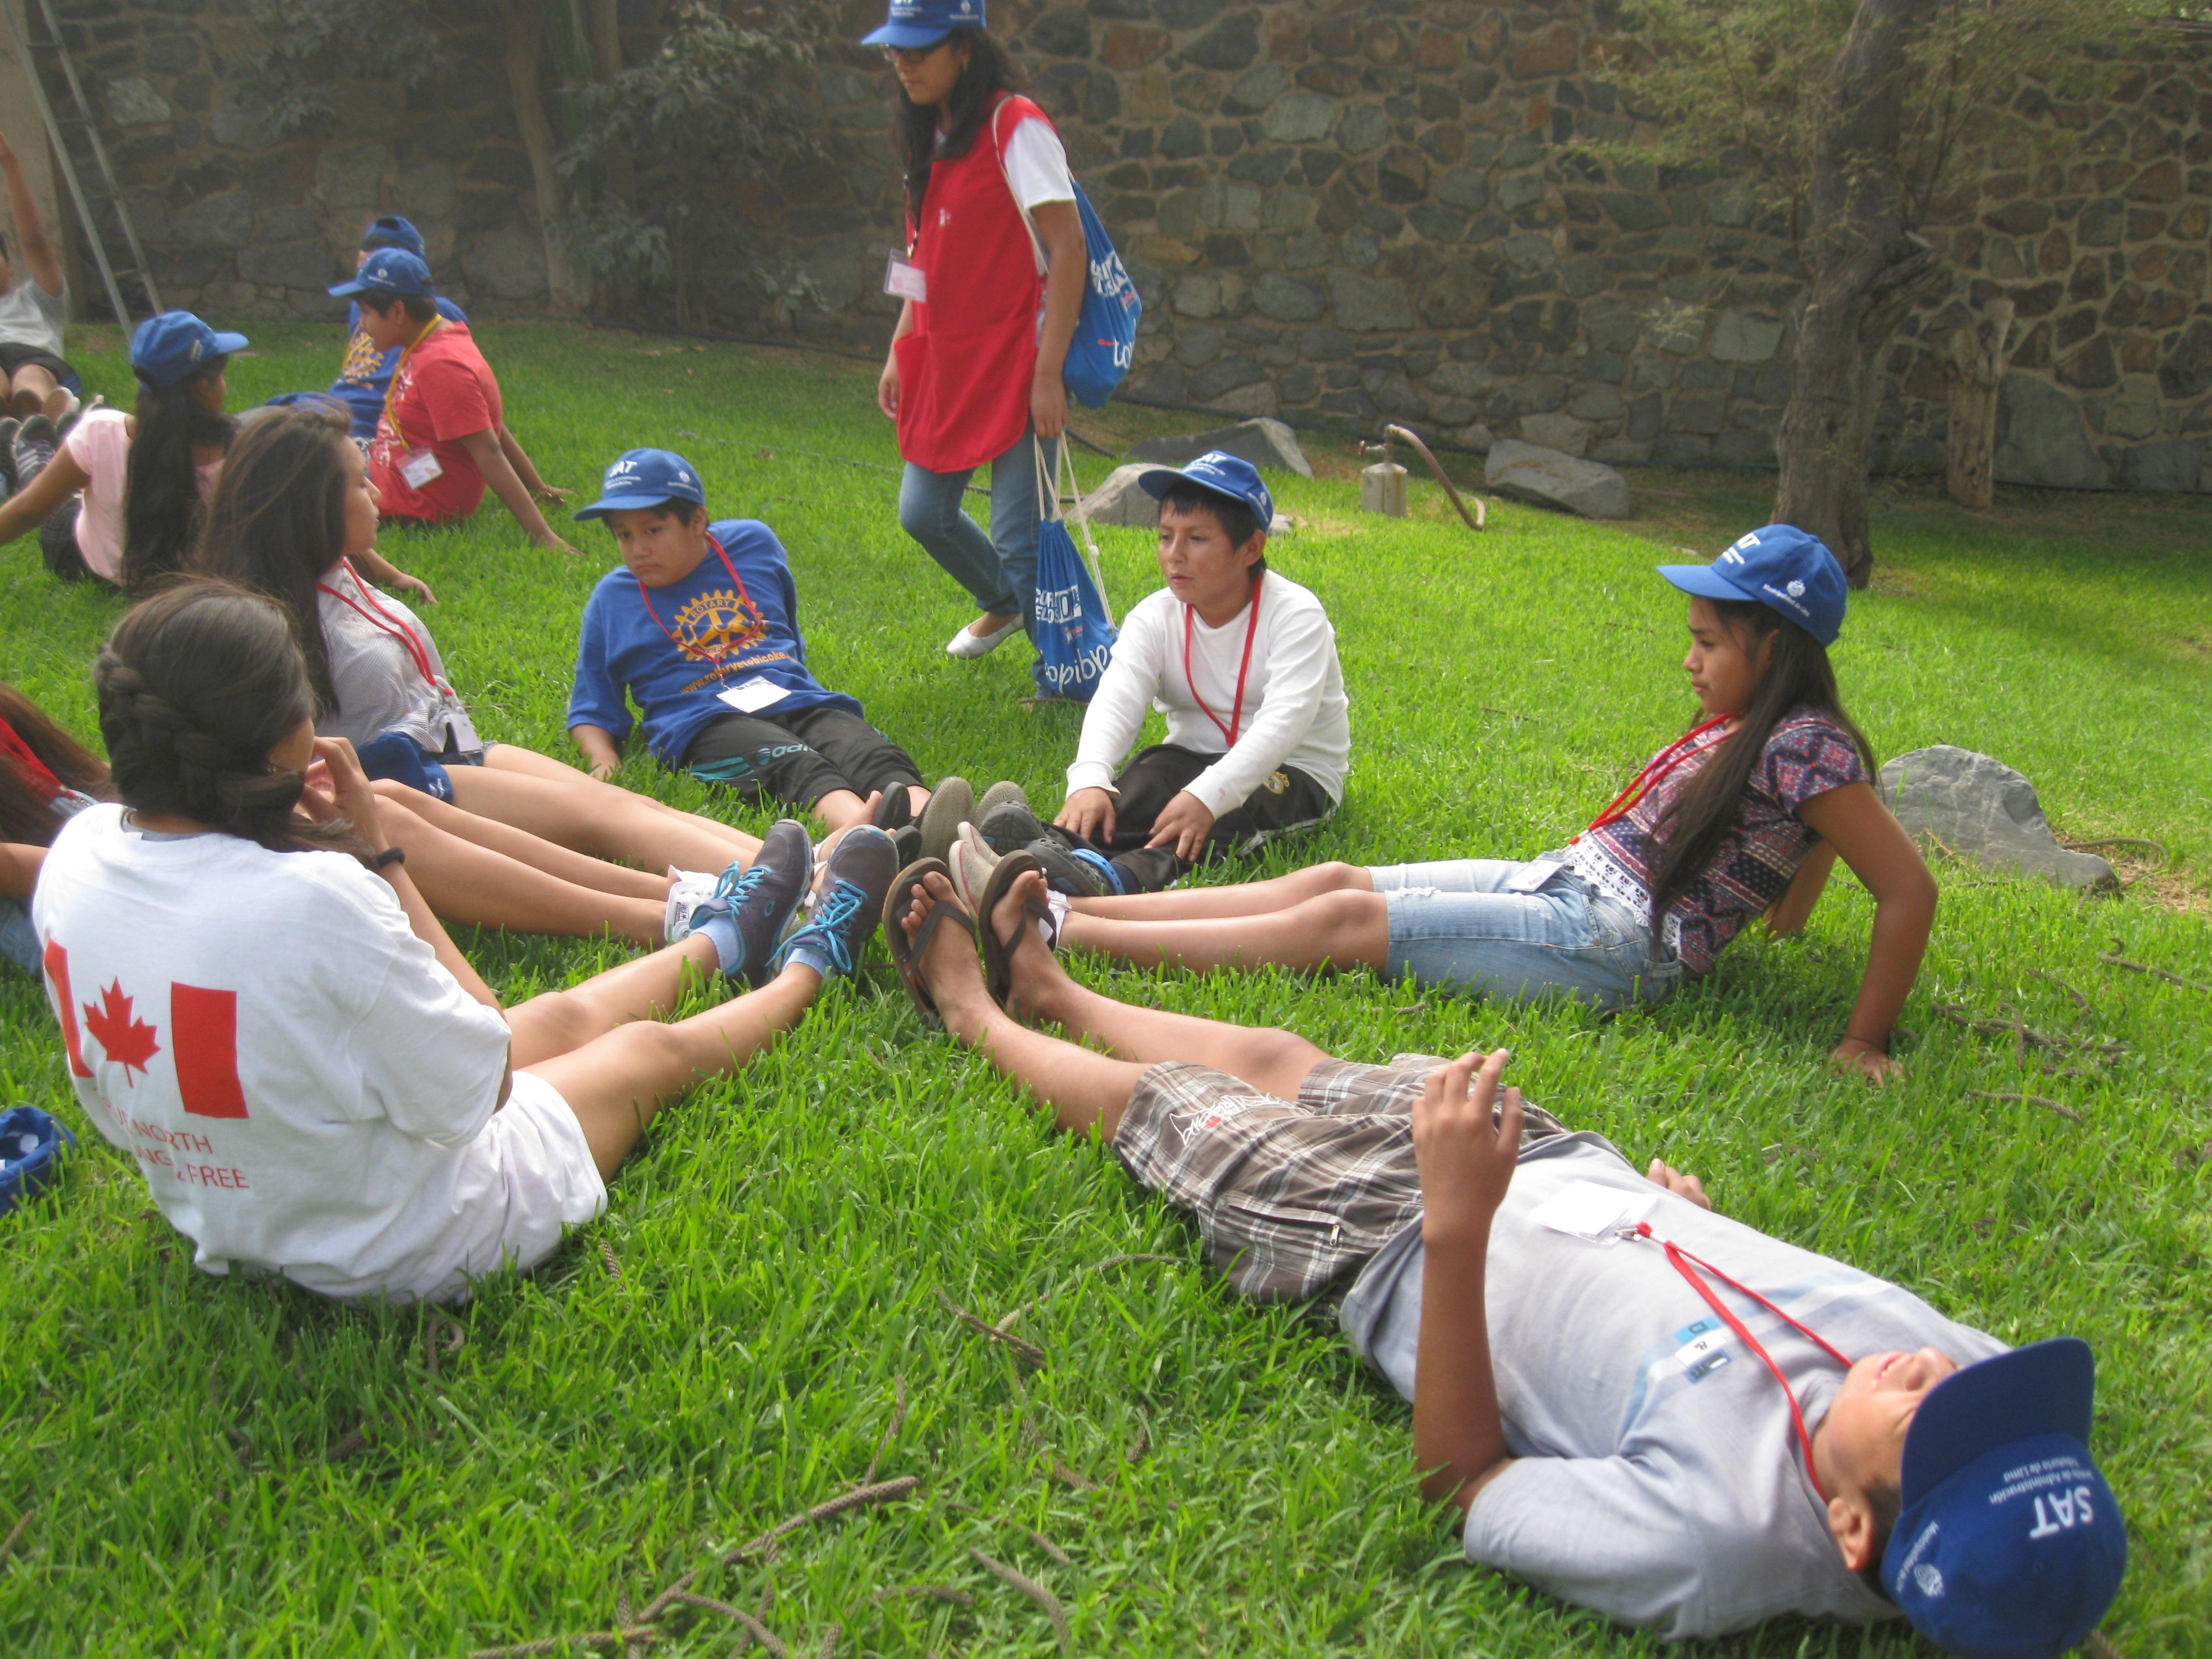 Campers play at CAFA camp